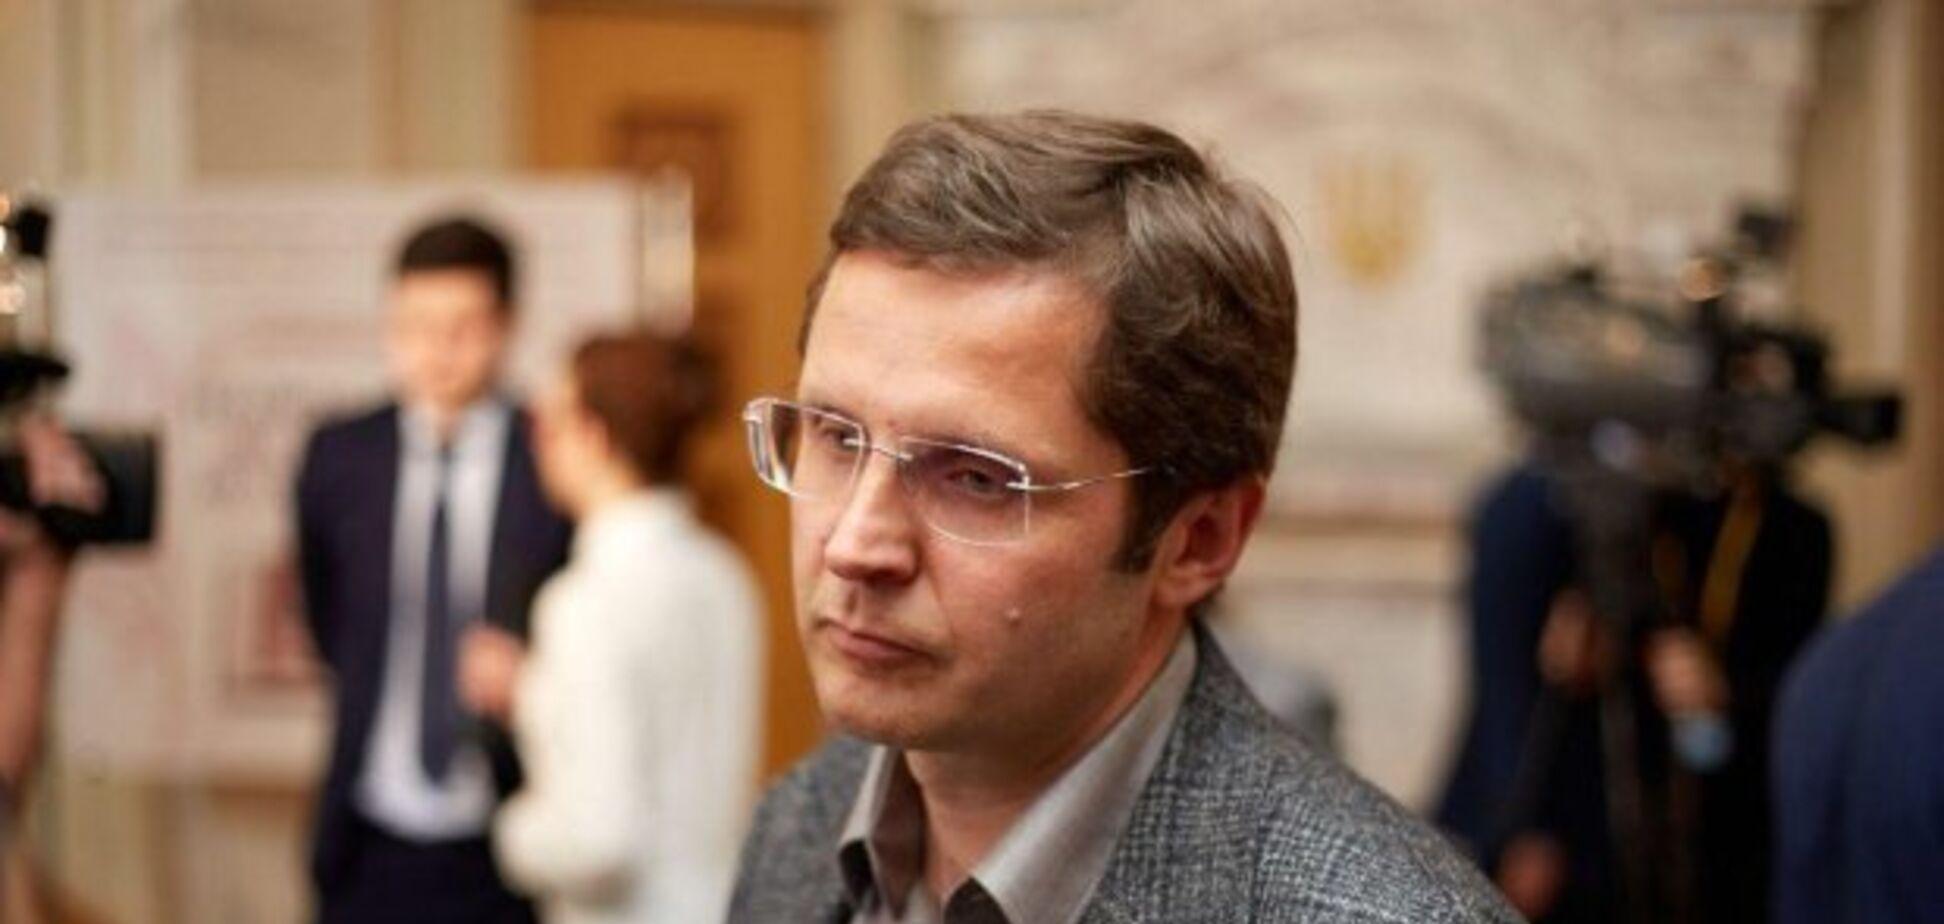 Нардеп Холодов объяснил побег на Кипр коронавирусом